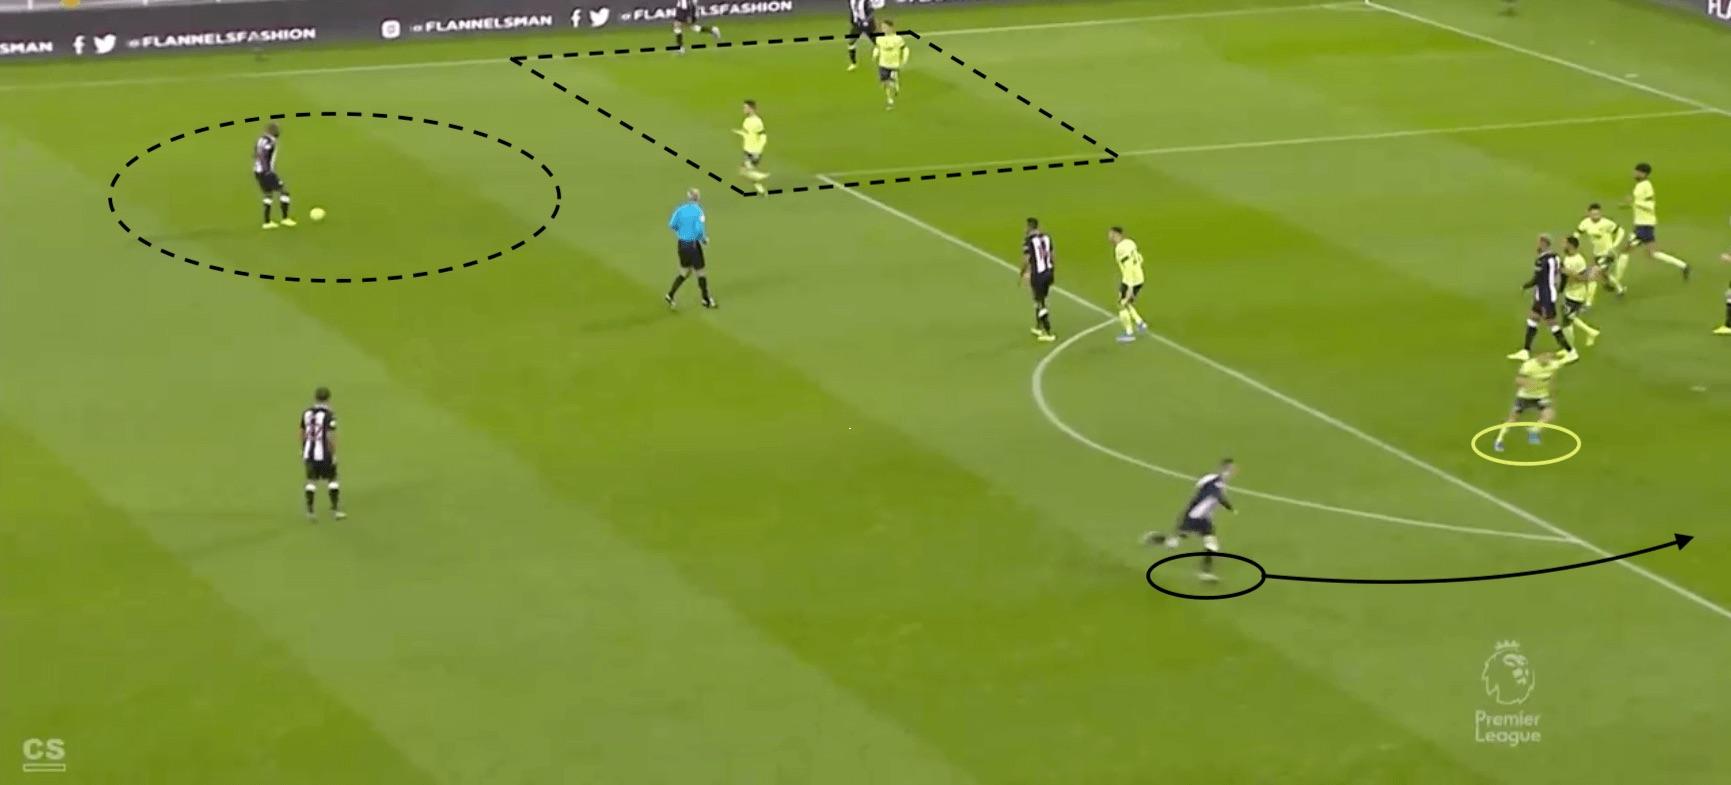 Premier League 2019/20: Newcastle's corner success - set piece analysis tactical analysis tactics